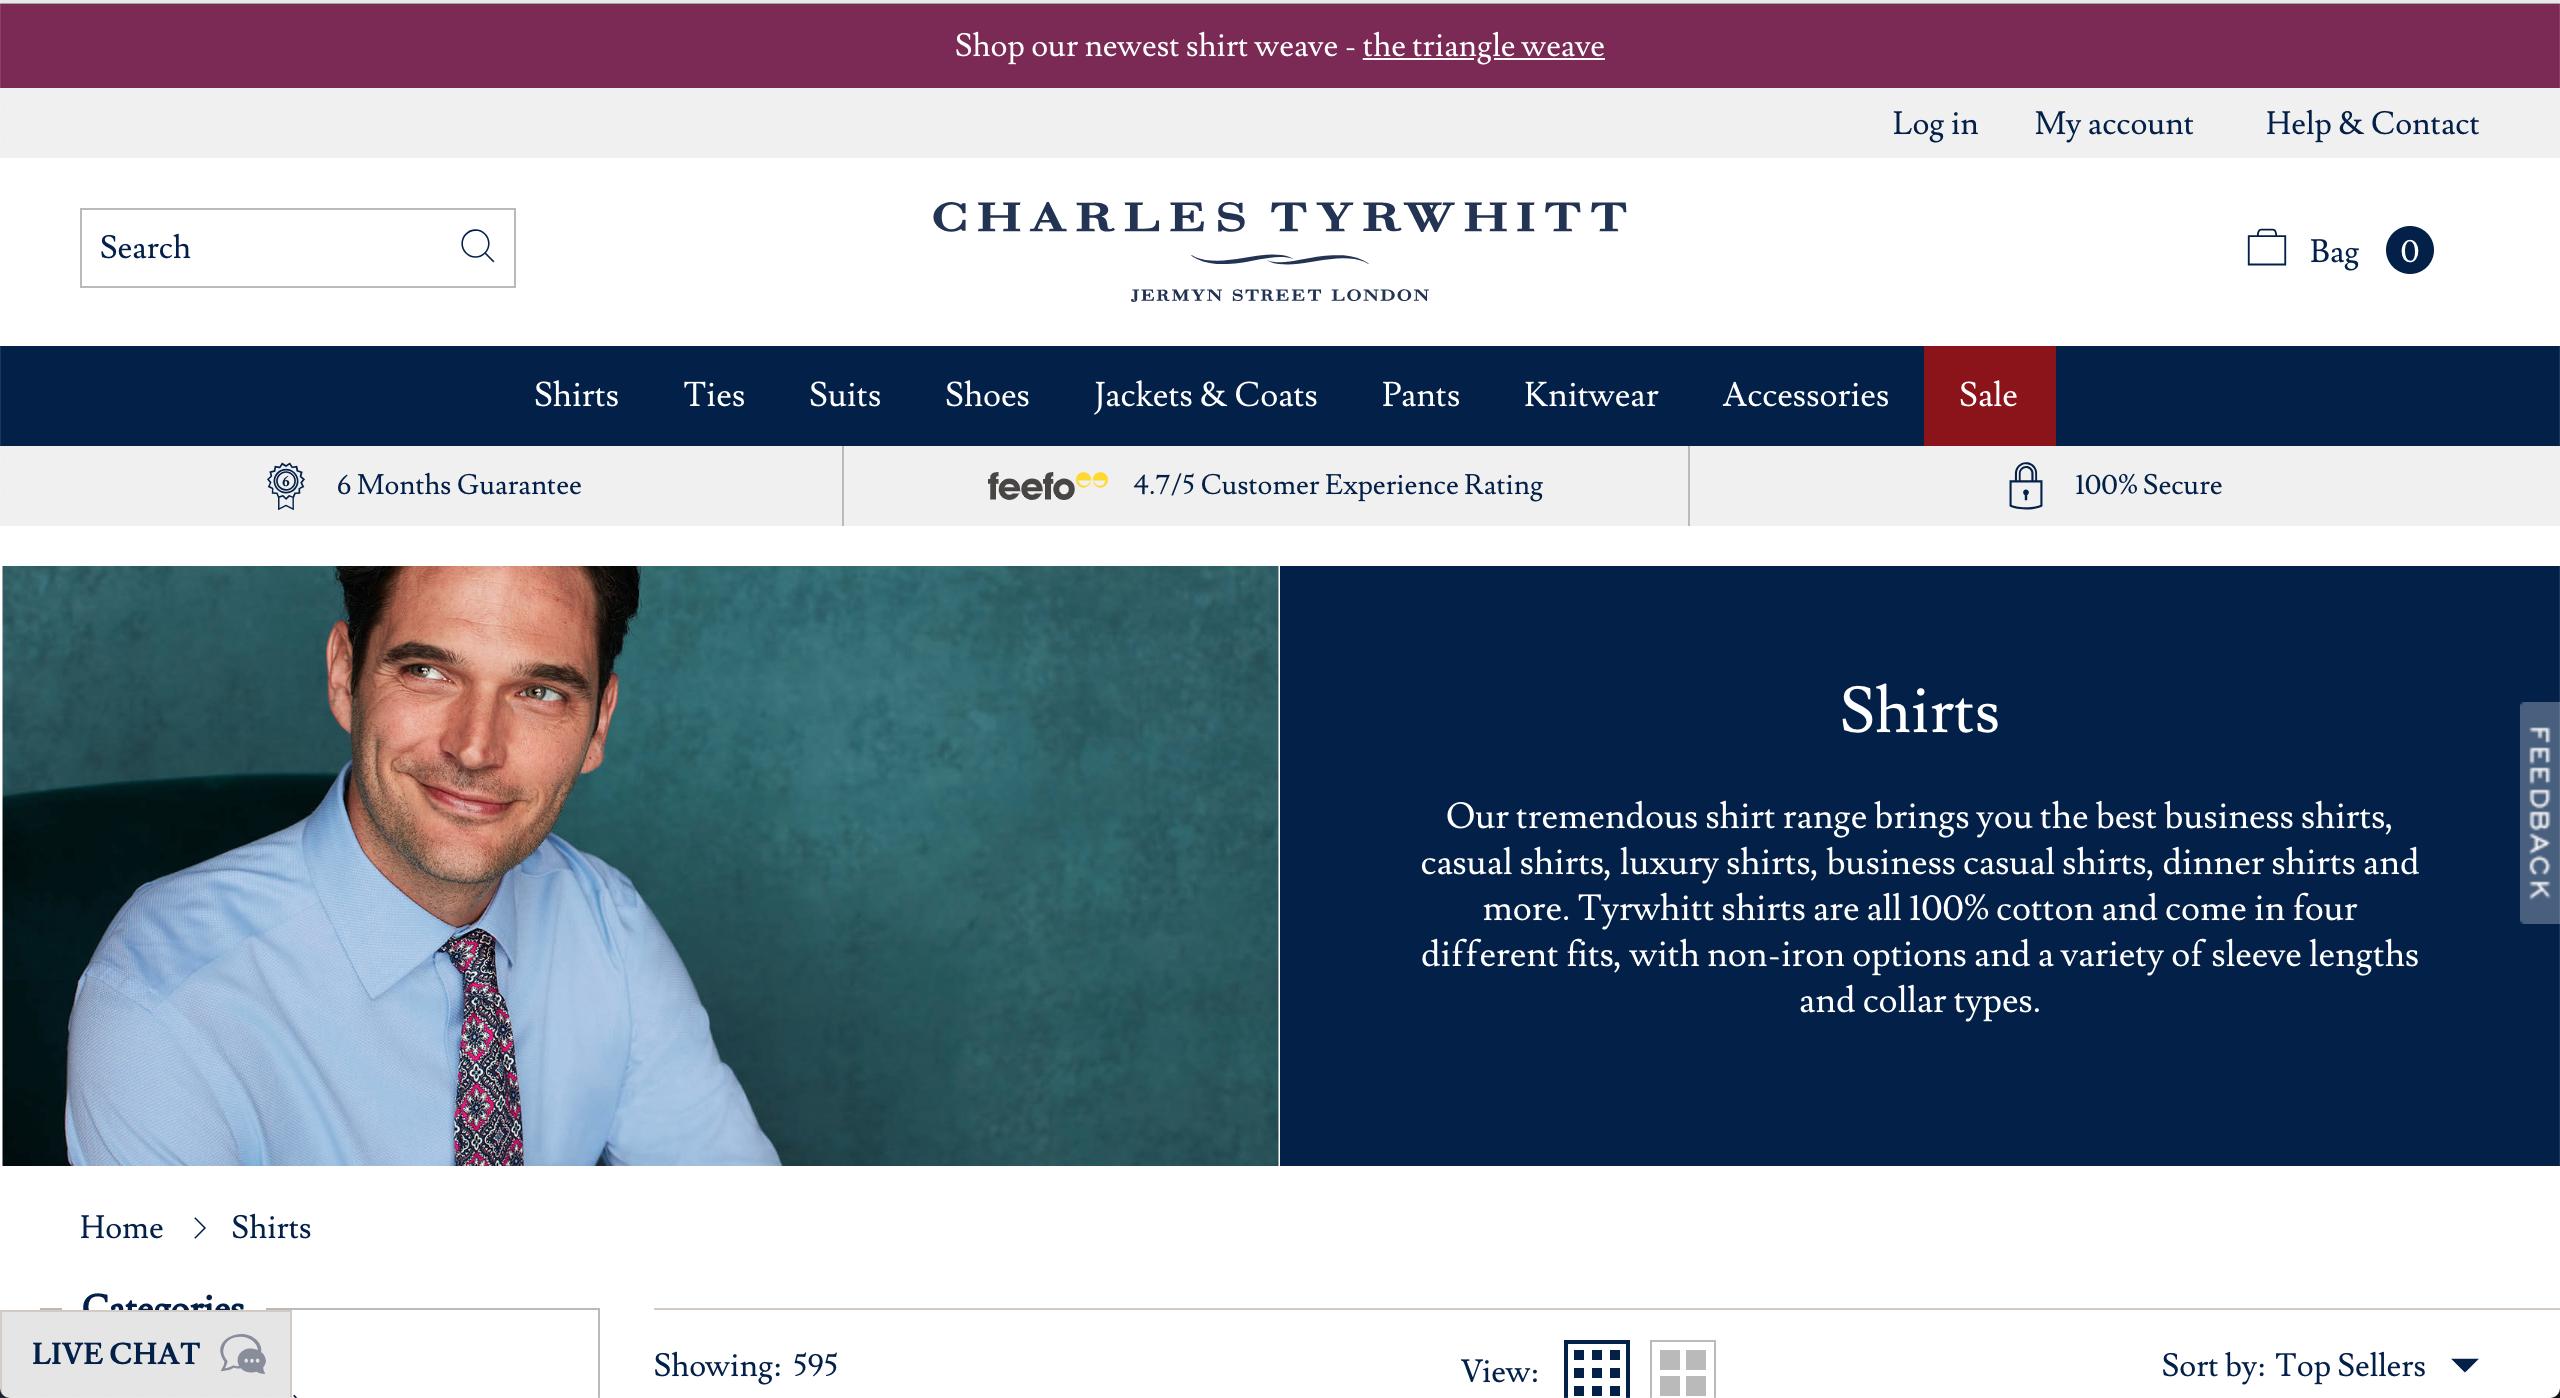 Charles Tyrwhitt shirts page